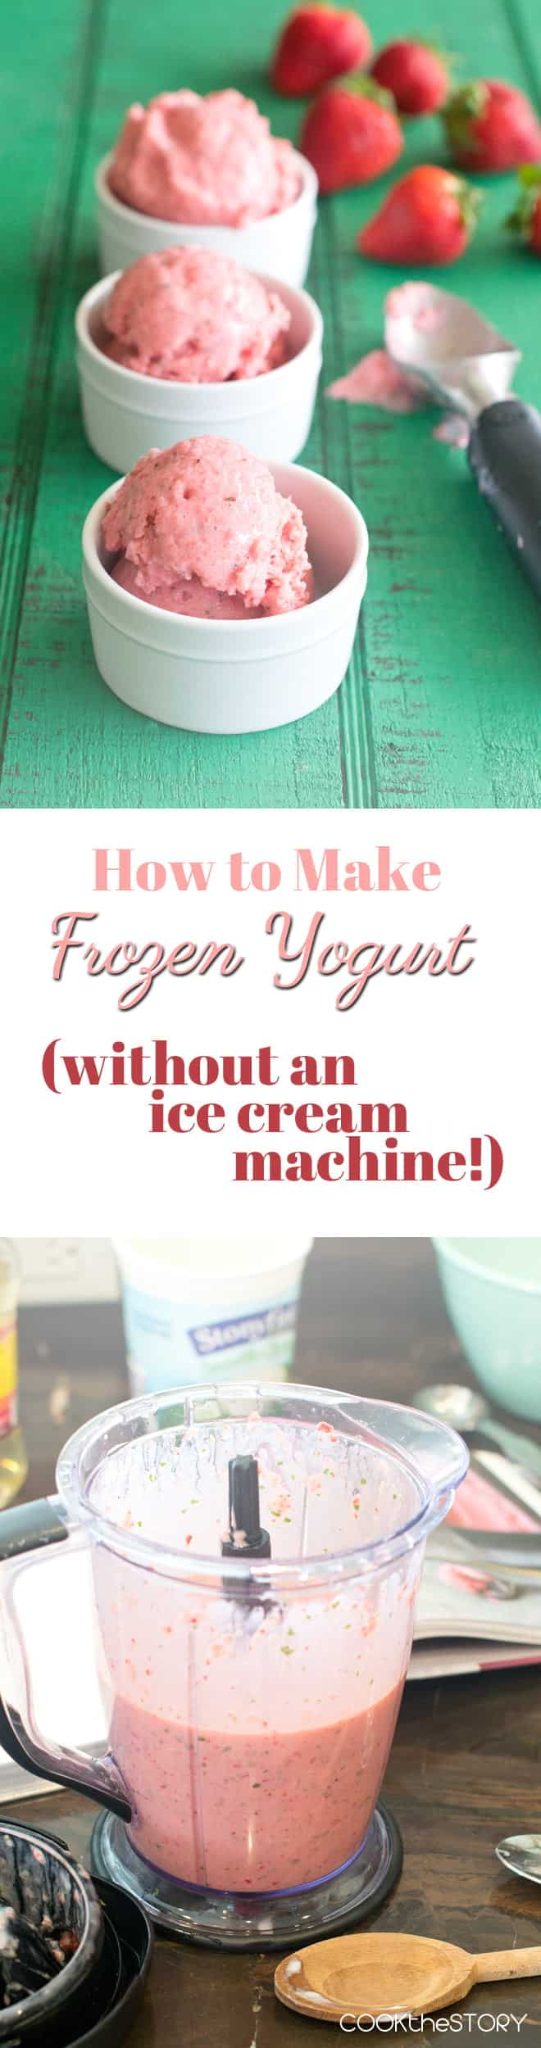 How to Make Frozen Yogurt Without an Ice Cream Maker (and Strawberry Basil Frozen Yogurt Recipe)